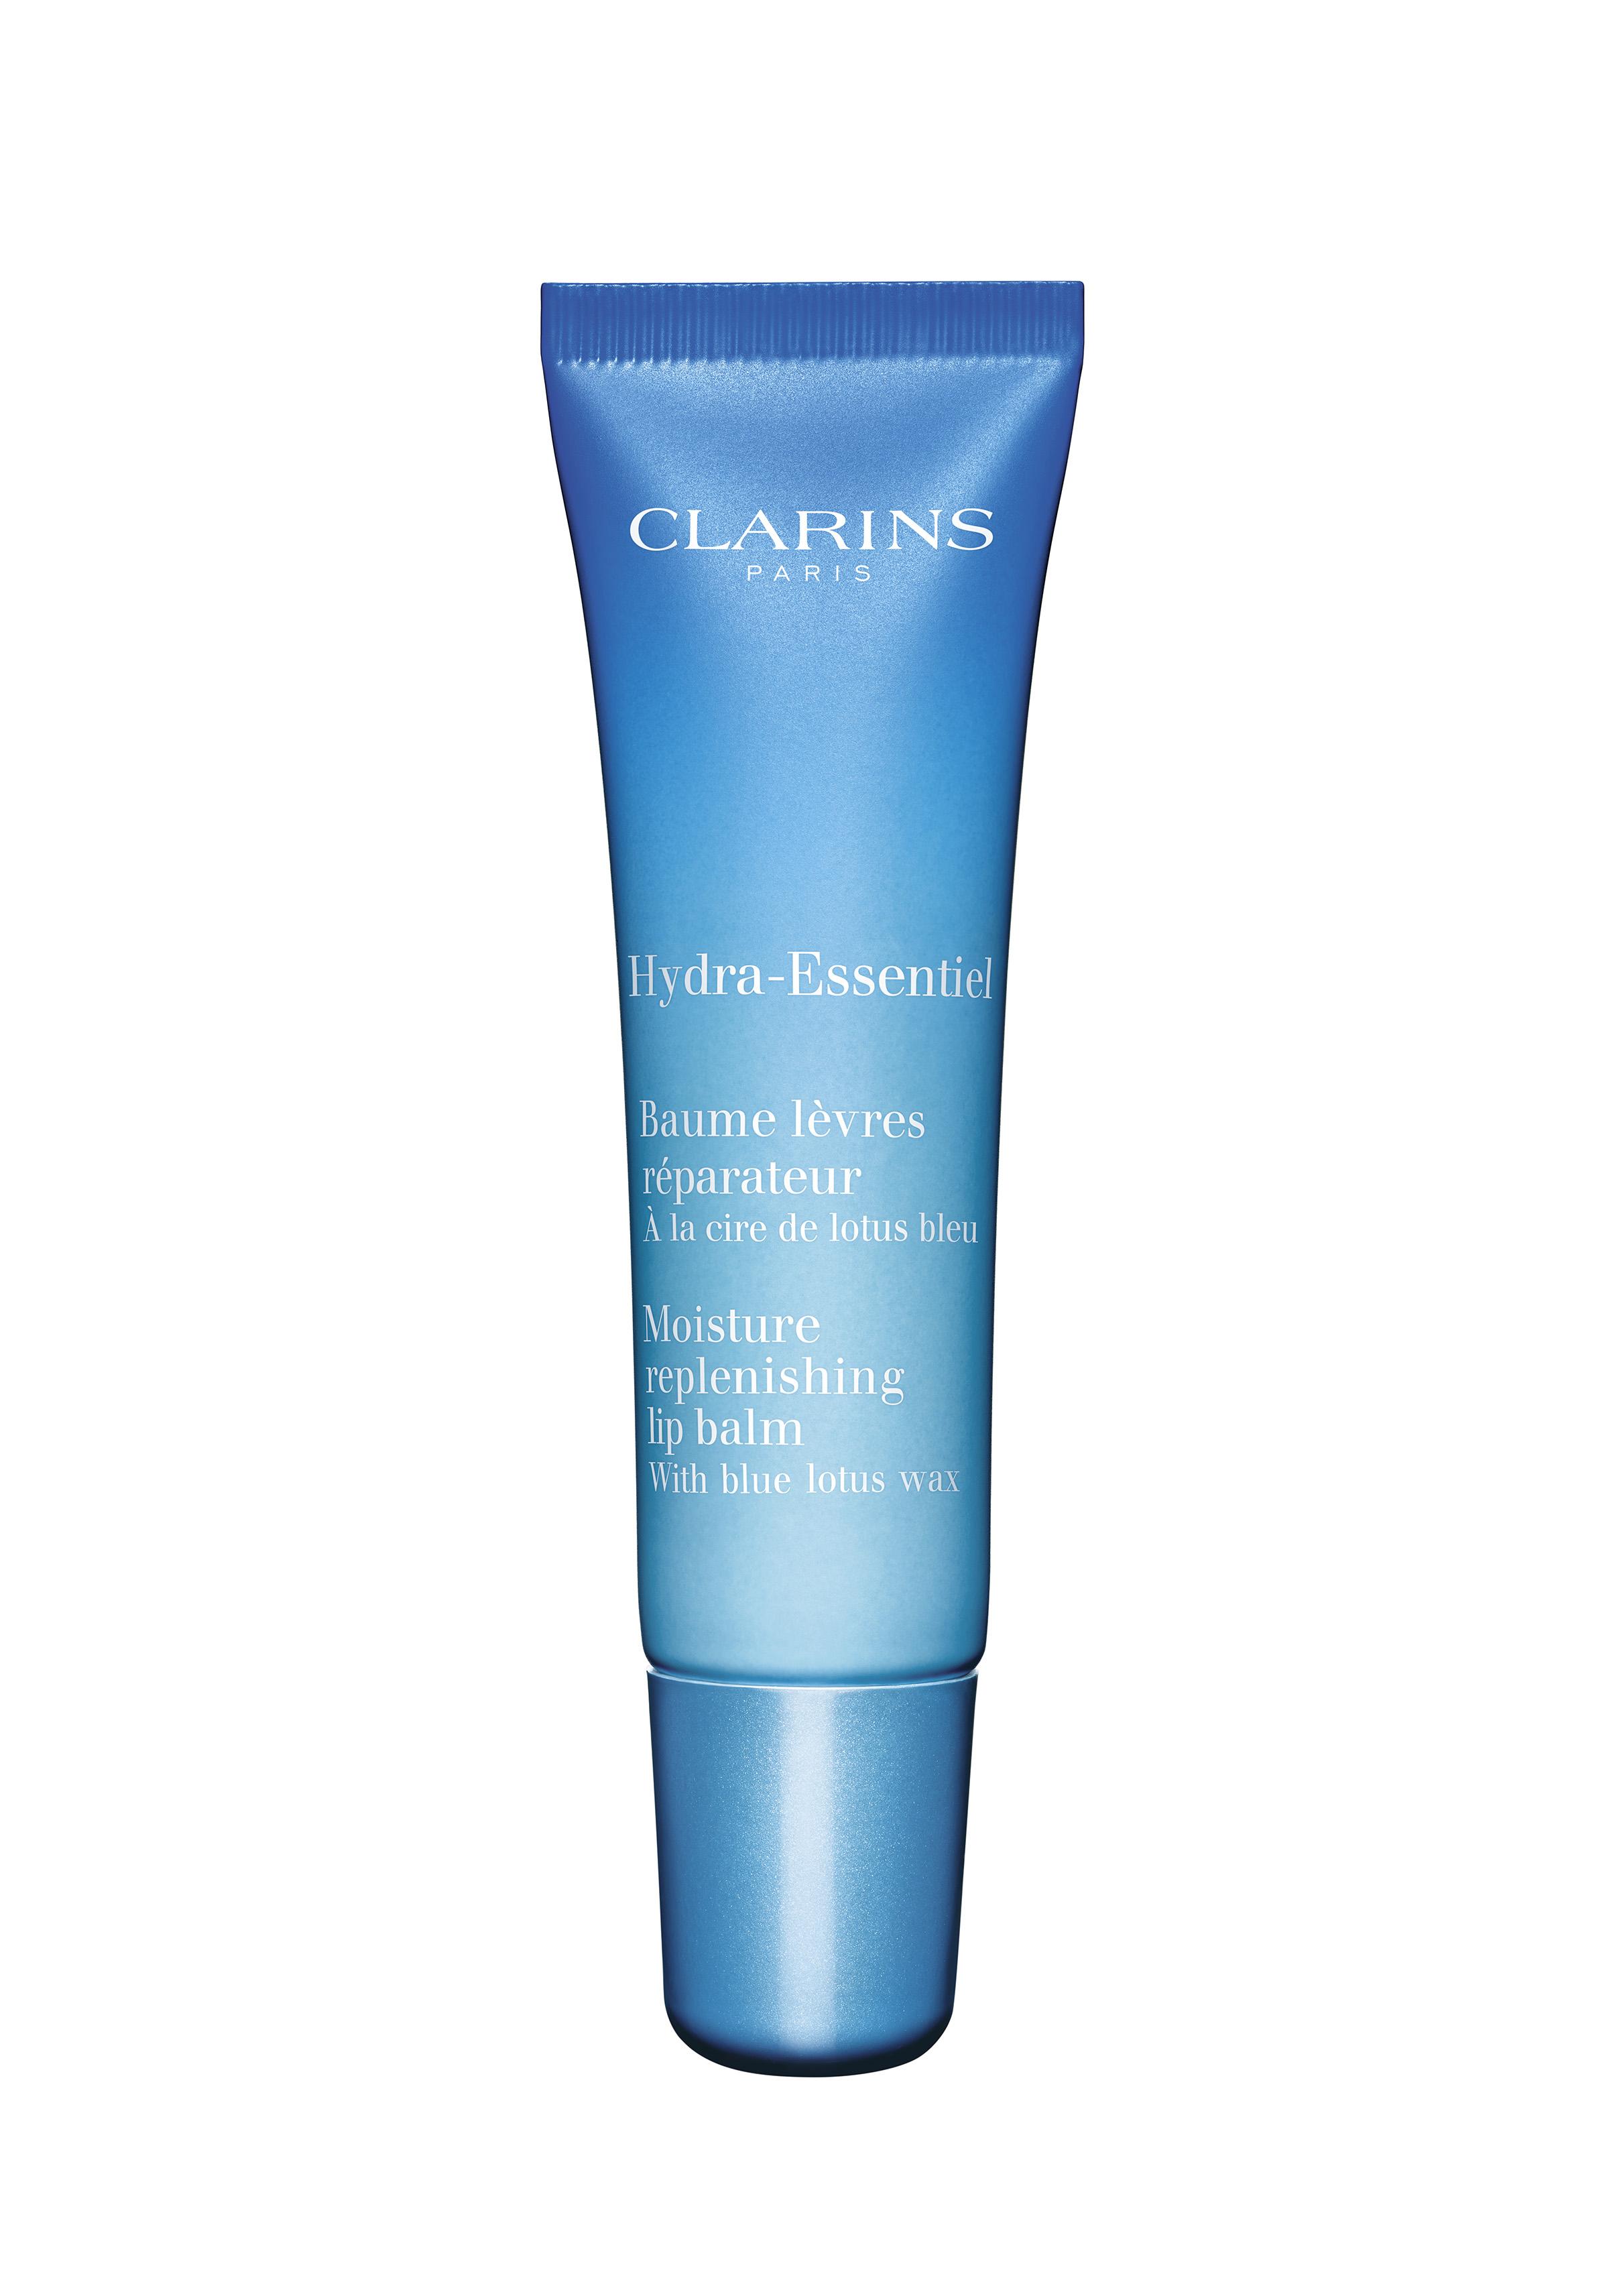 Hydra-Essentiel Moisture Replenishing Lip Balm 15ml